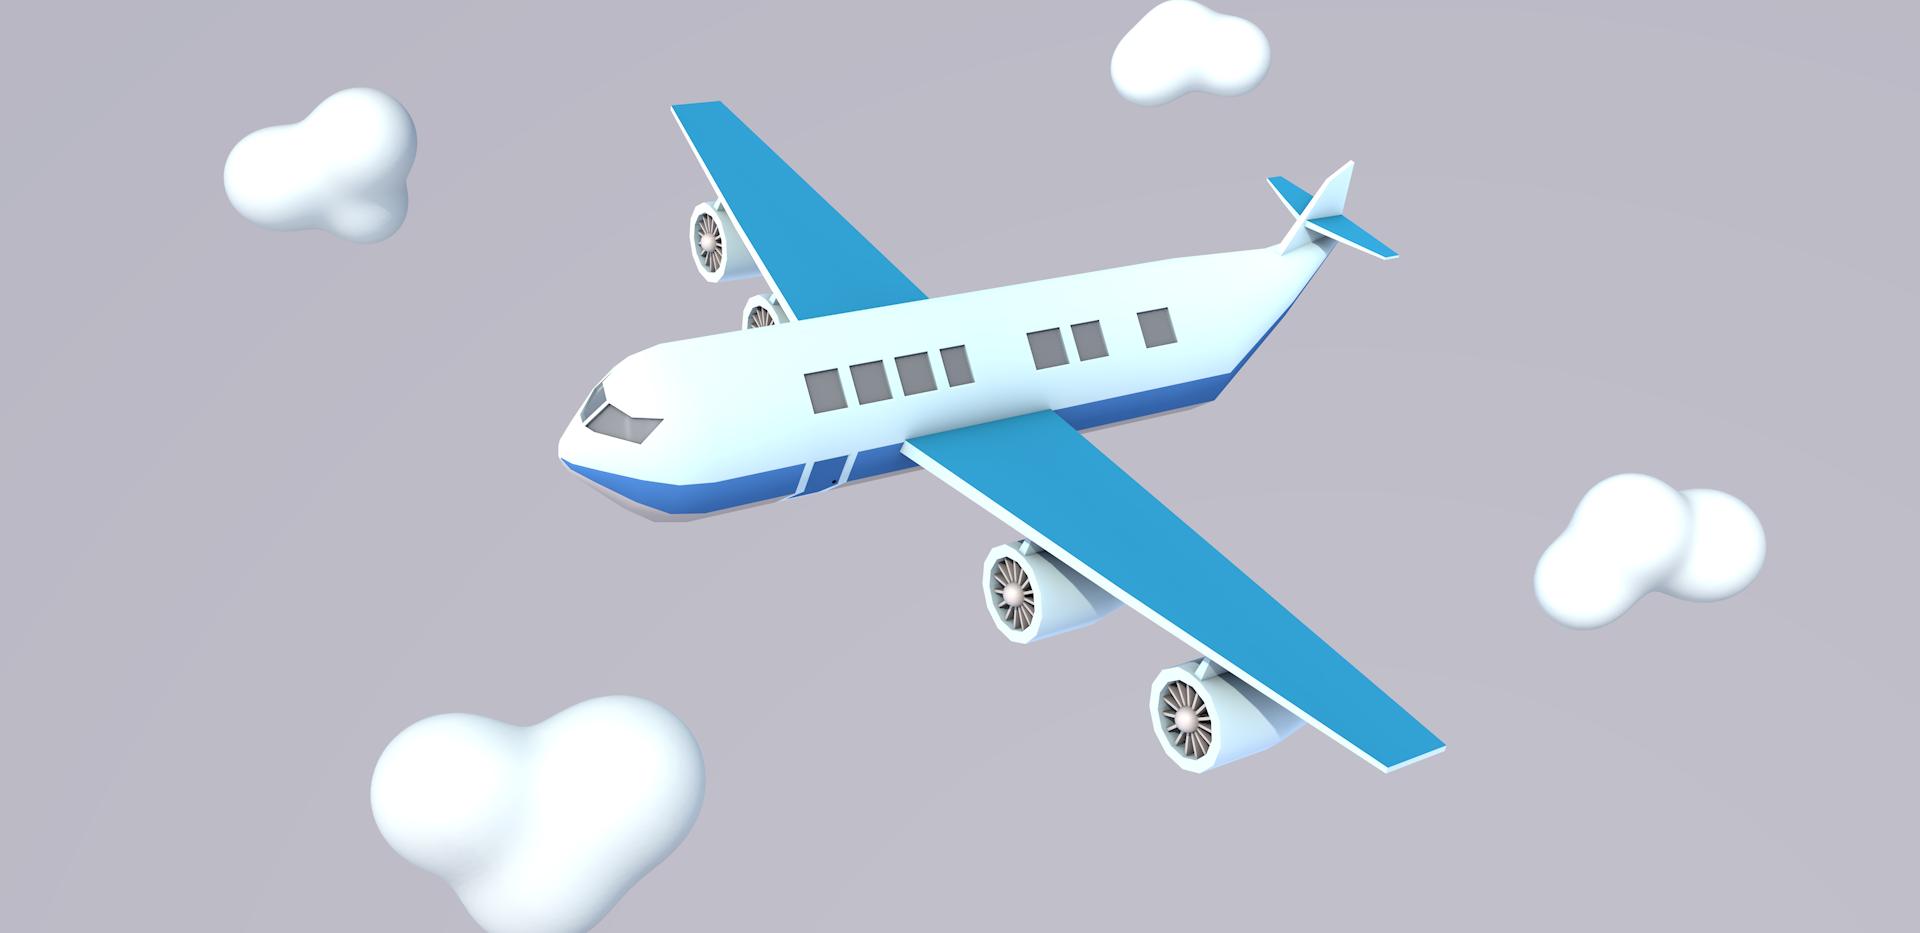 Plane 3.png